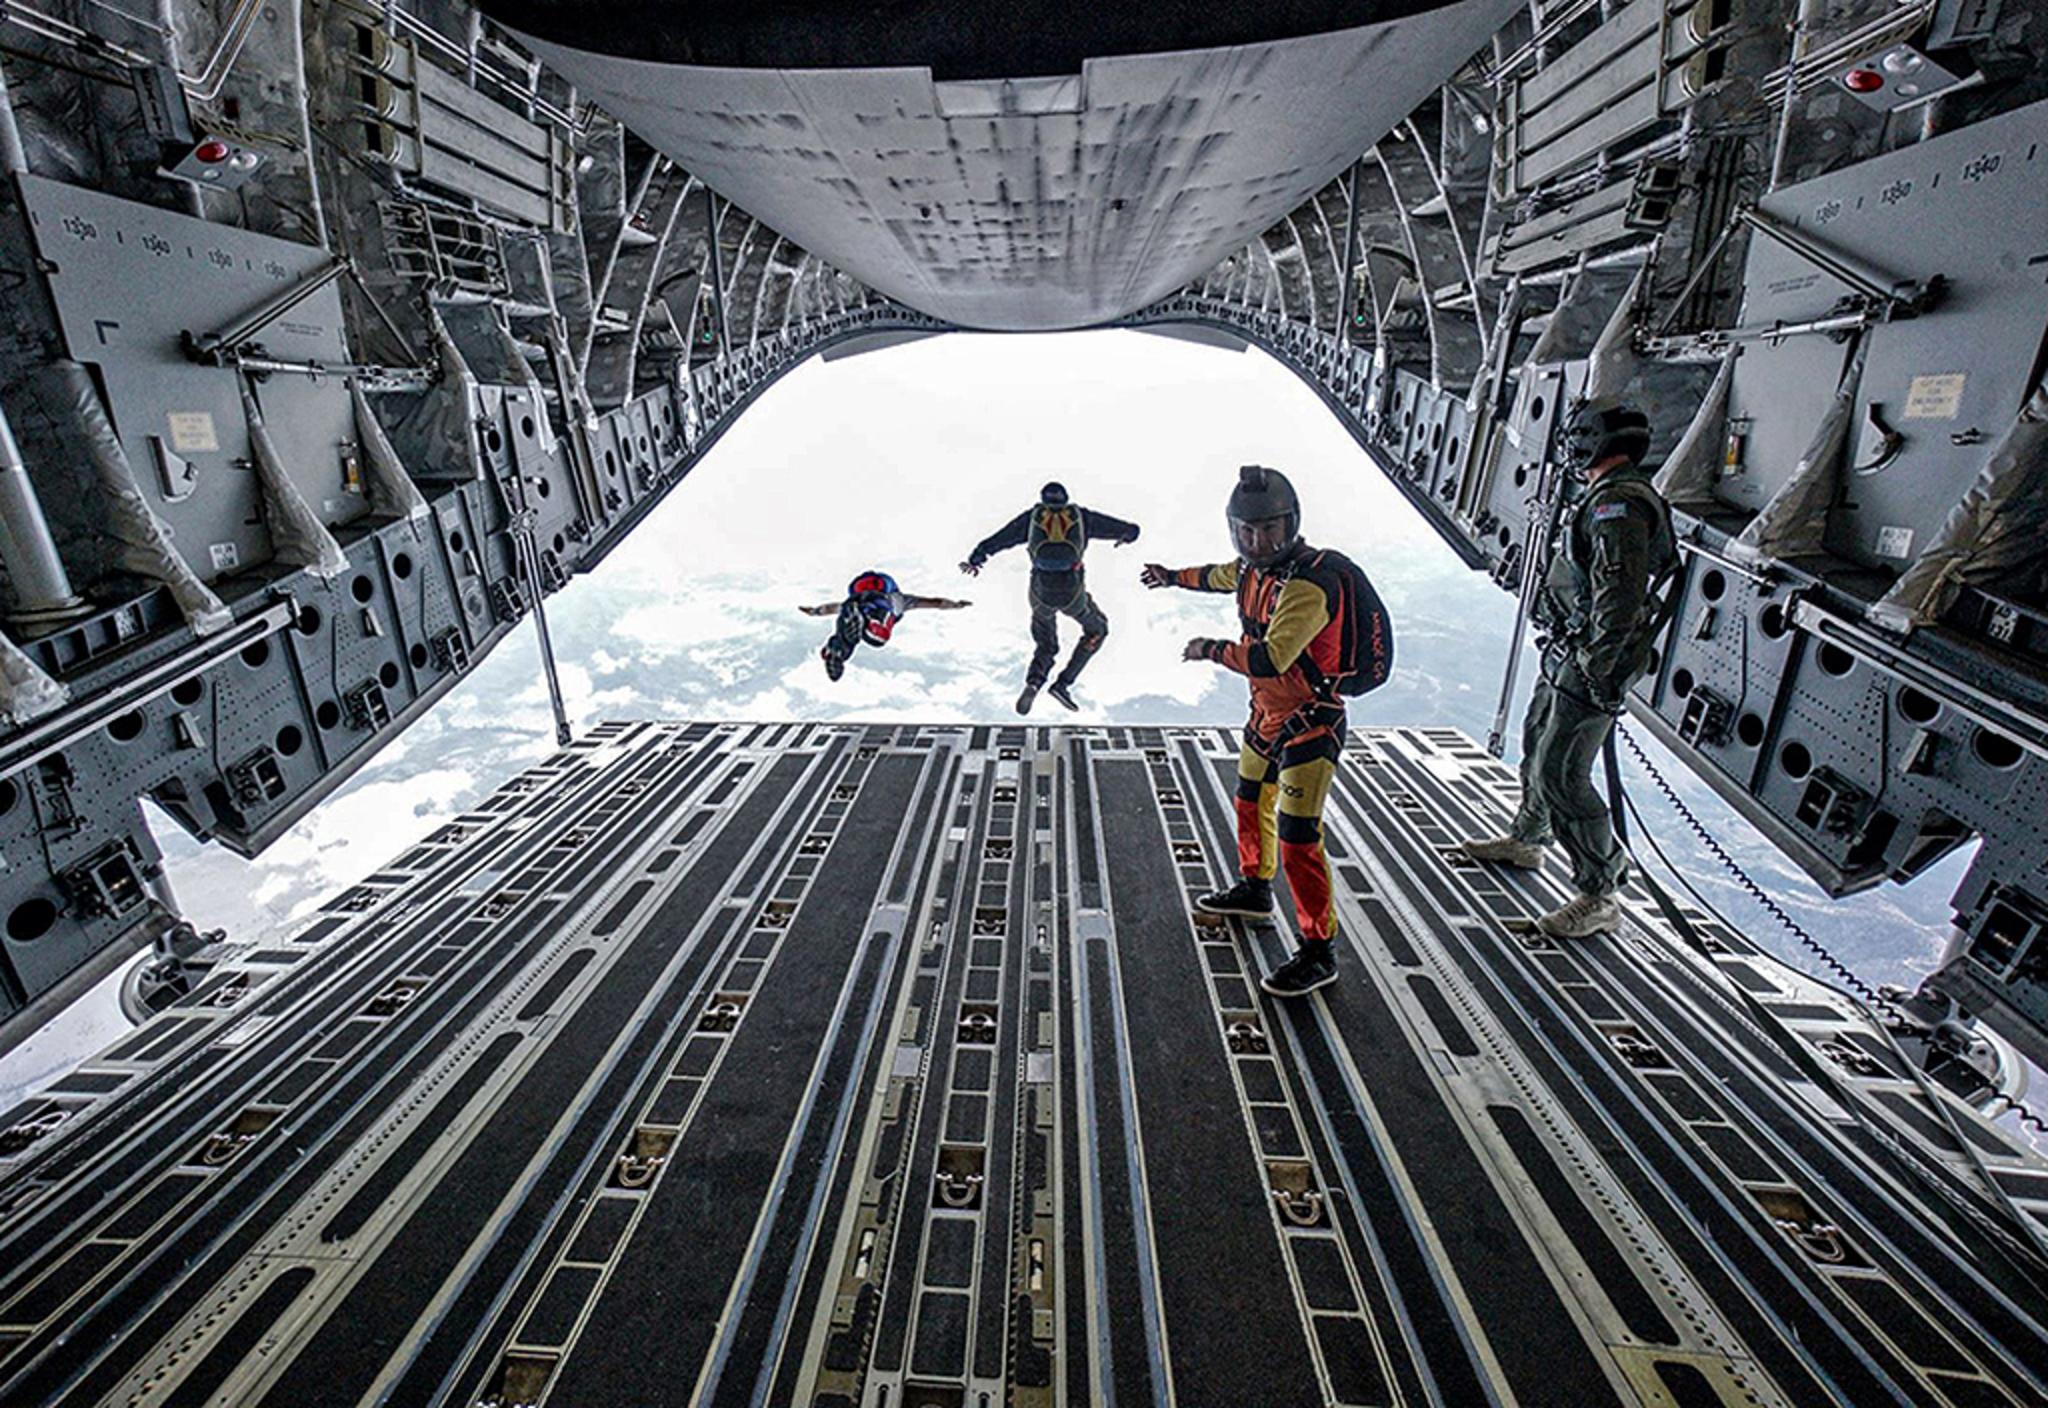 Skydiving out of a C17 Globemaster, by Mariska Folley. Image courtesy of Kian Bullock.